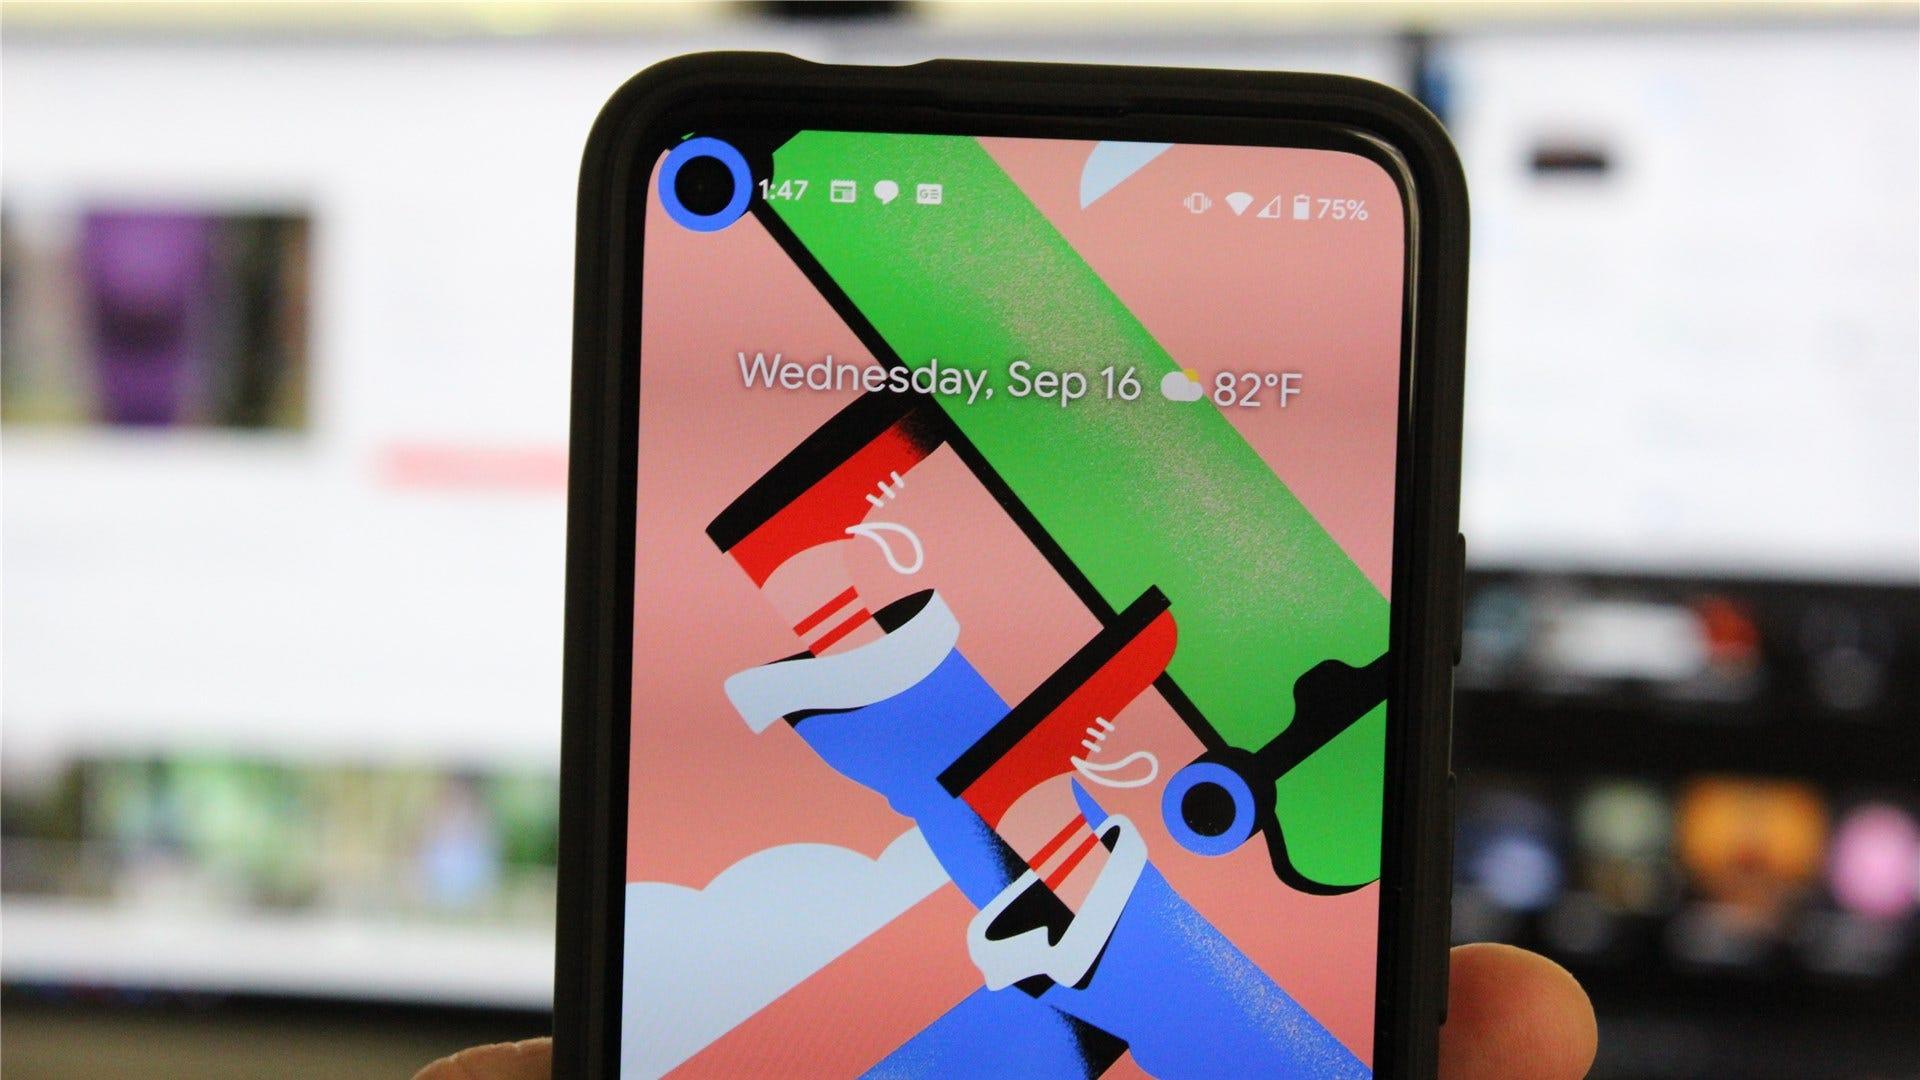 The Google Pixel 4a with a hidden hole punch wallpaper